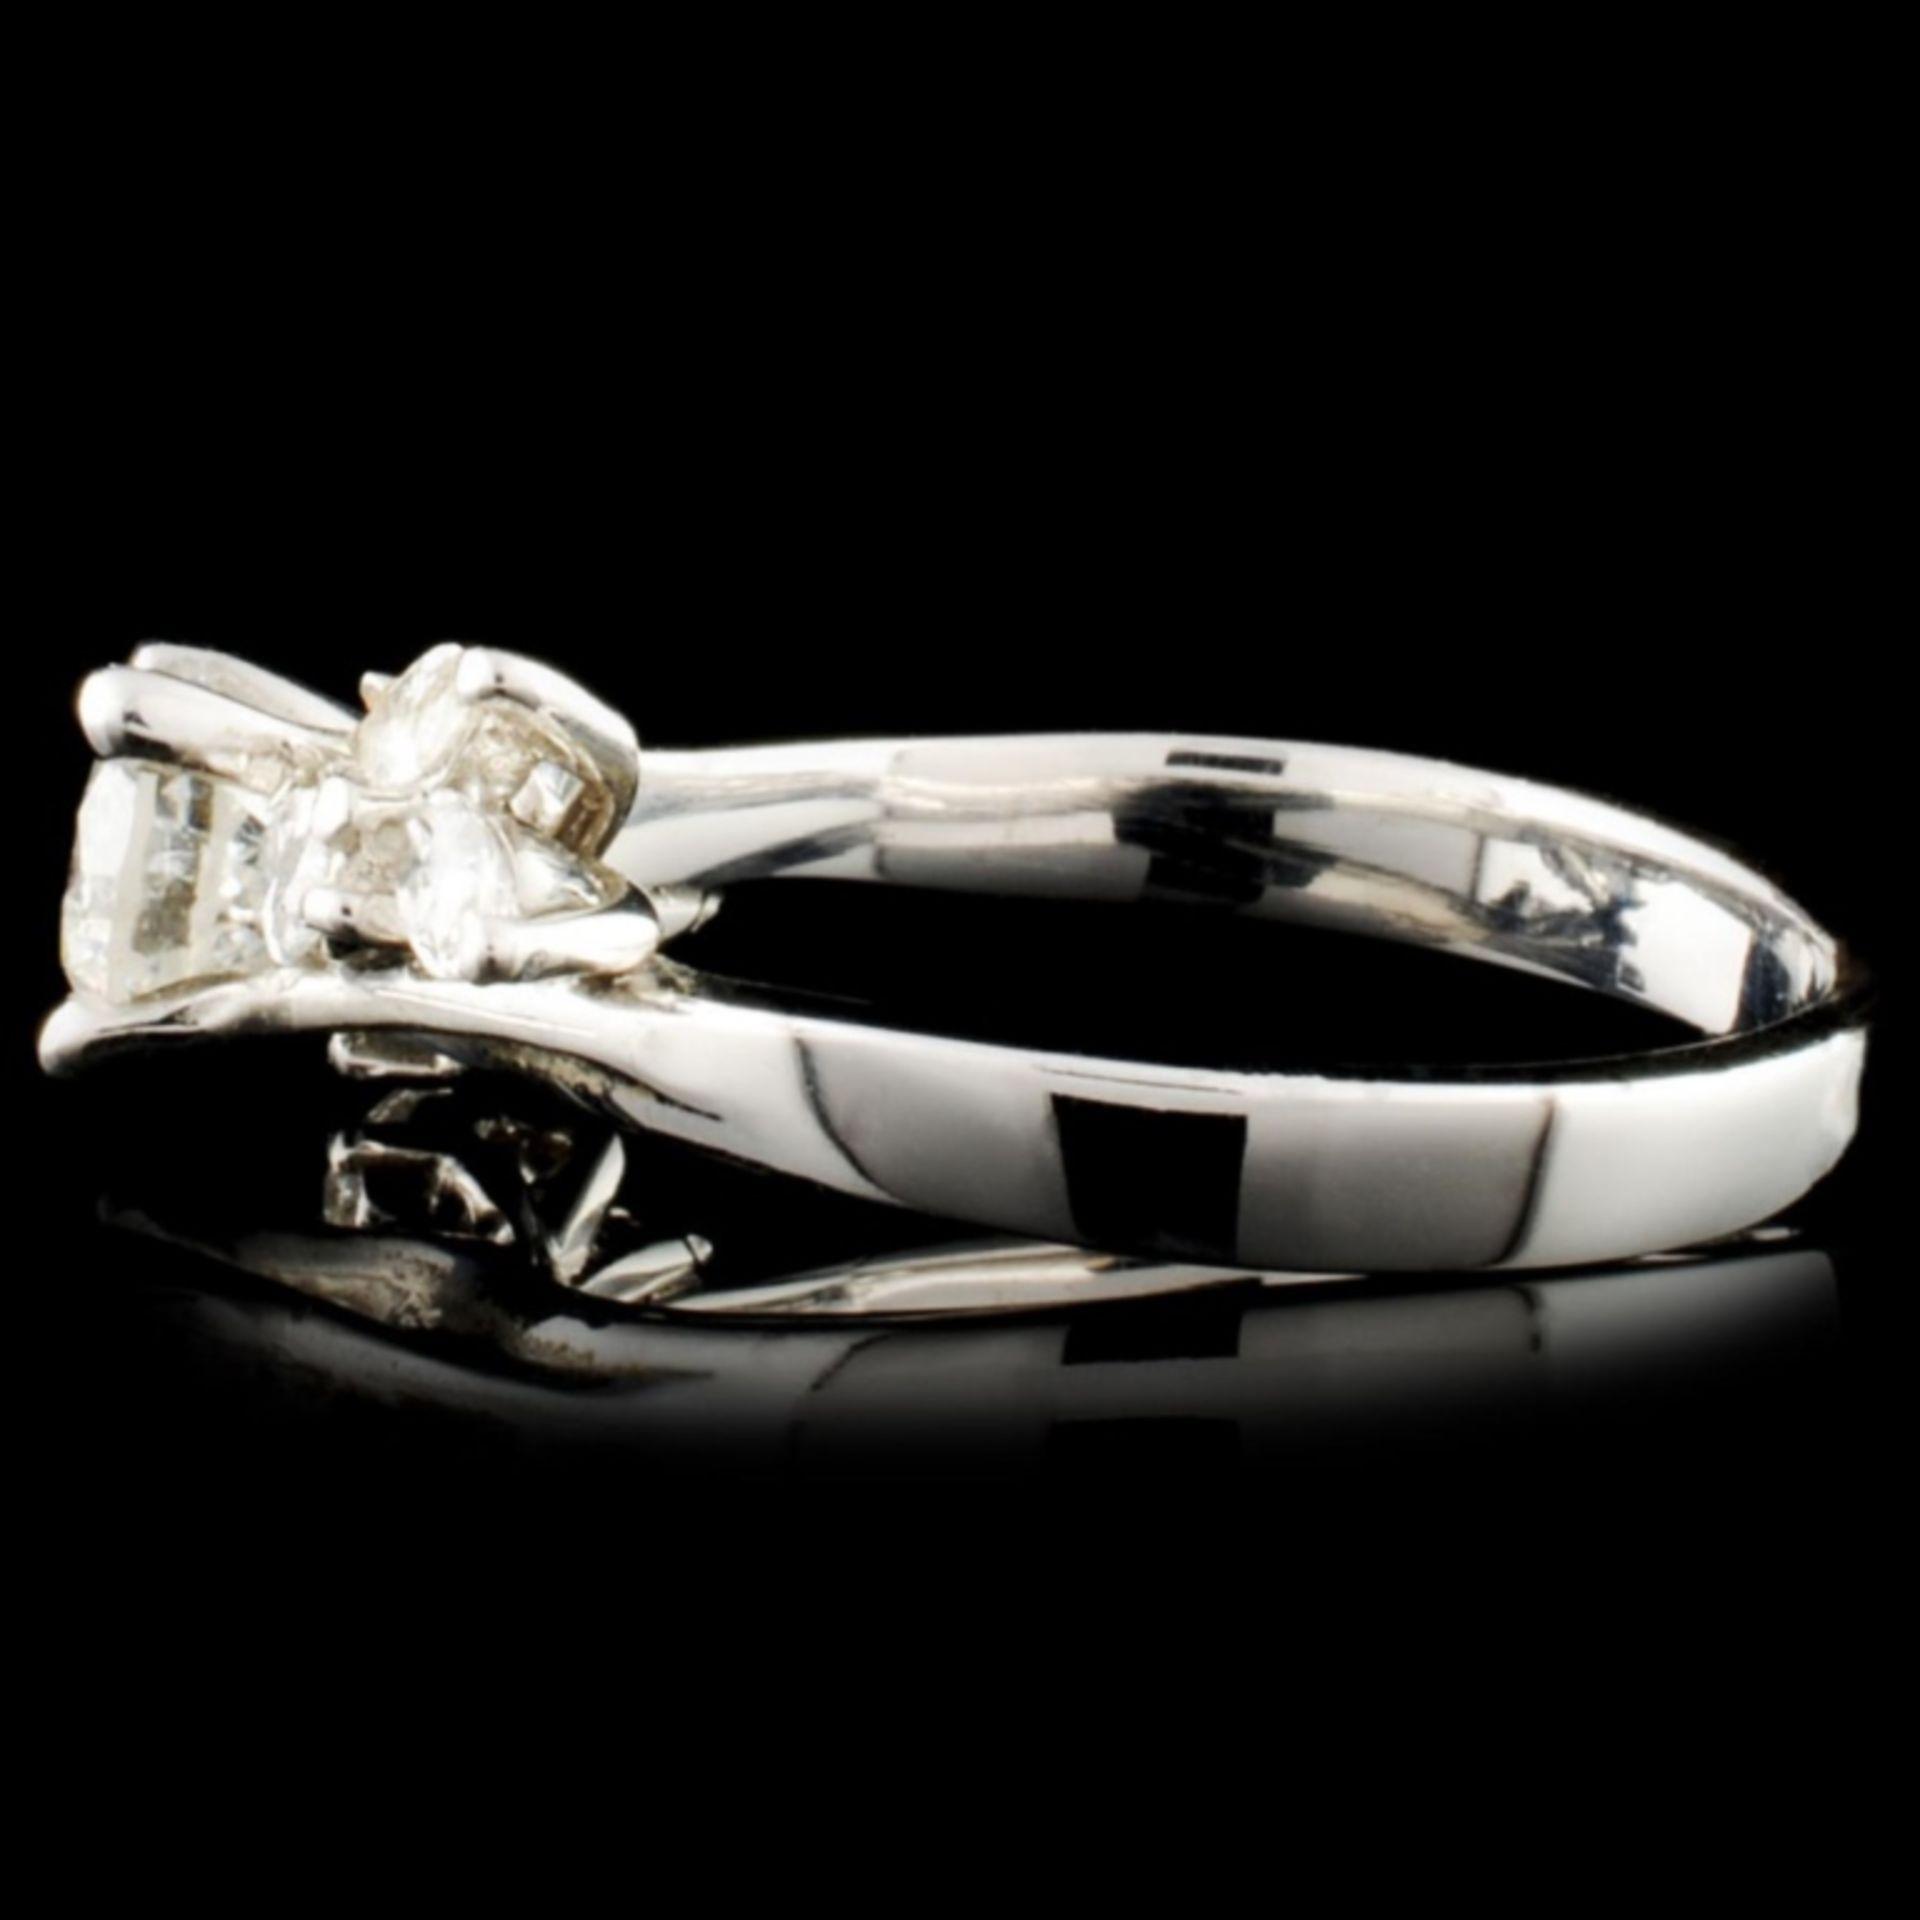 18K Gold 0.77ctw Diamond Ring - Image 3 of 3